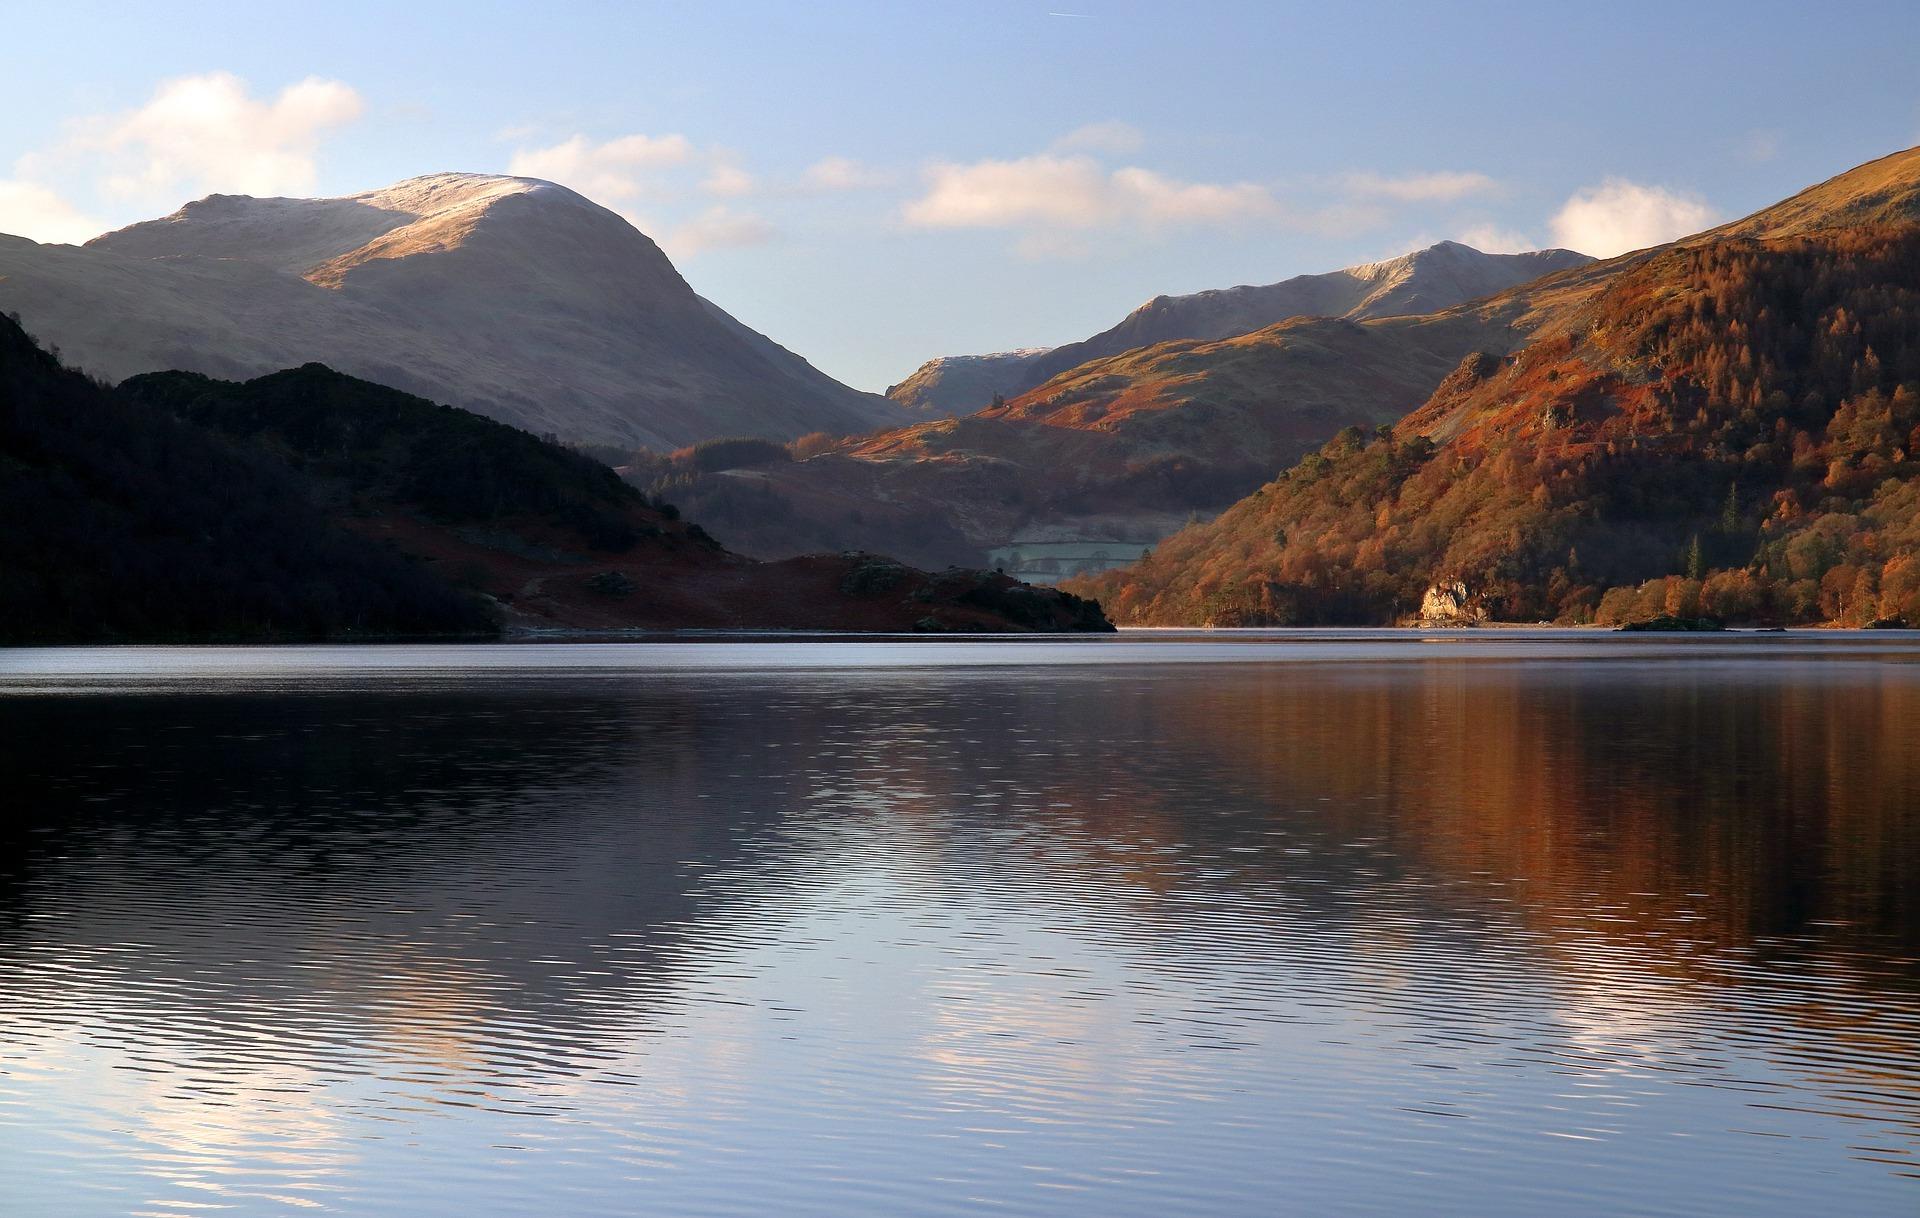 Scenic Cumbria makes the 'cool list'